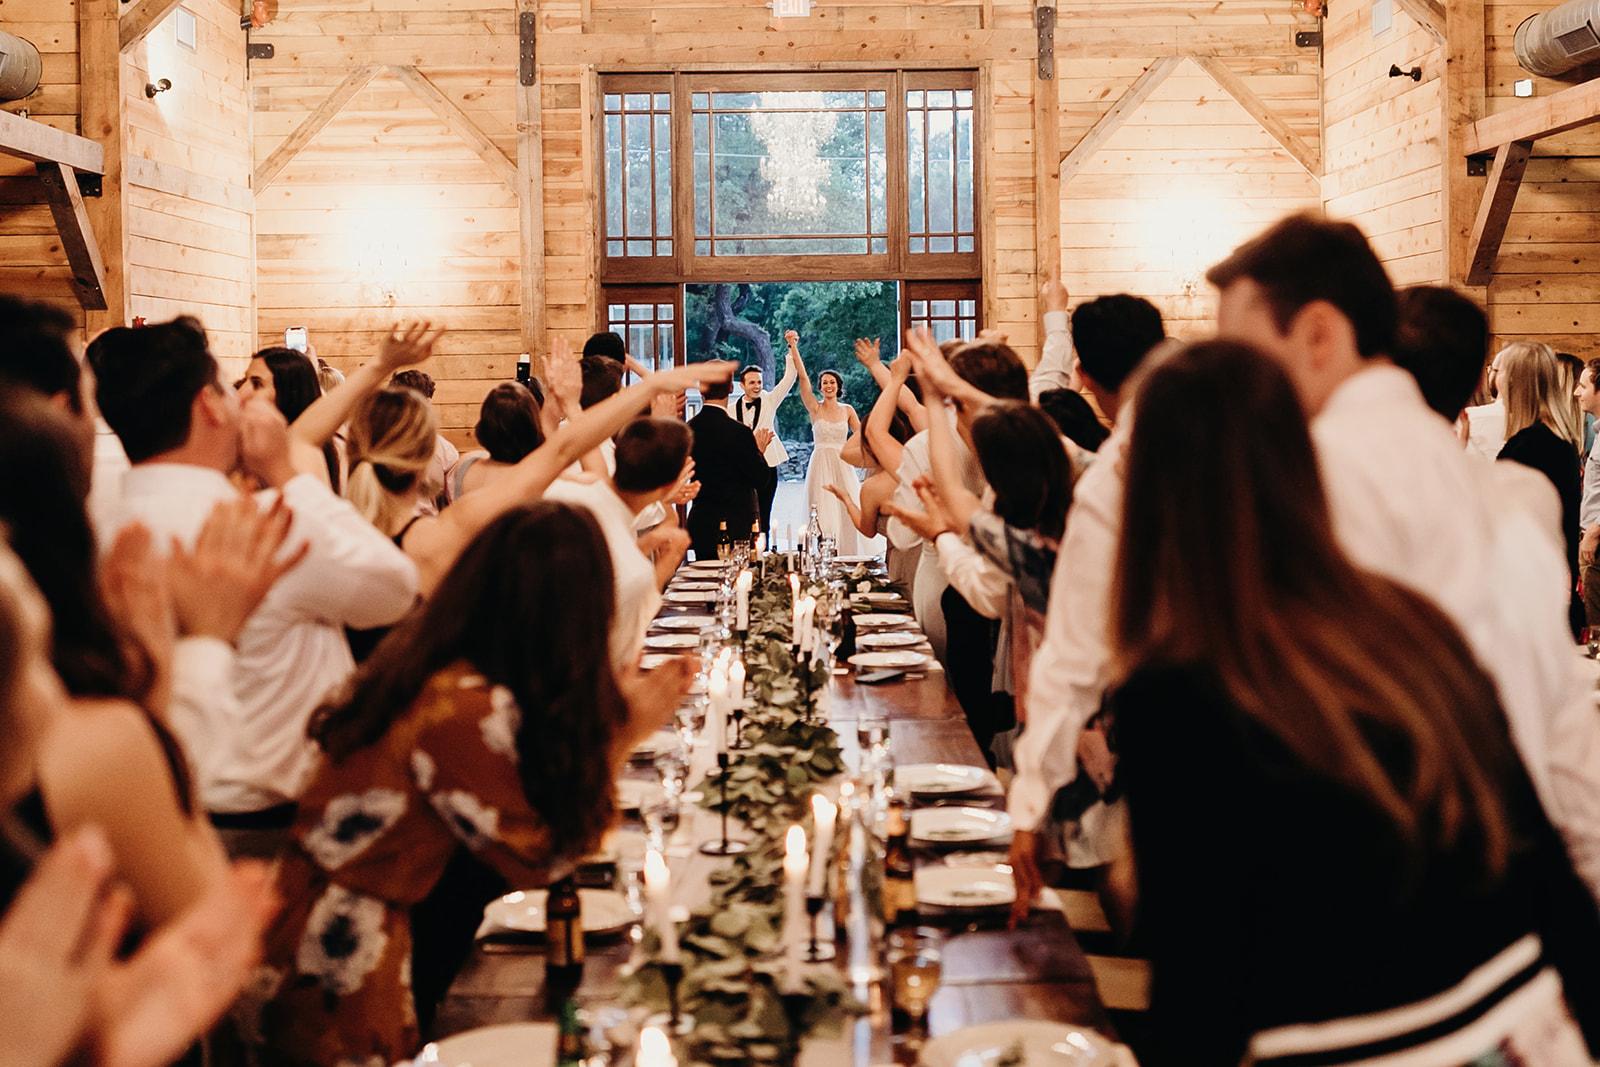 austin-wedding-lindsey-bryce-716.jpg